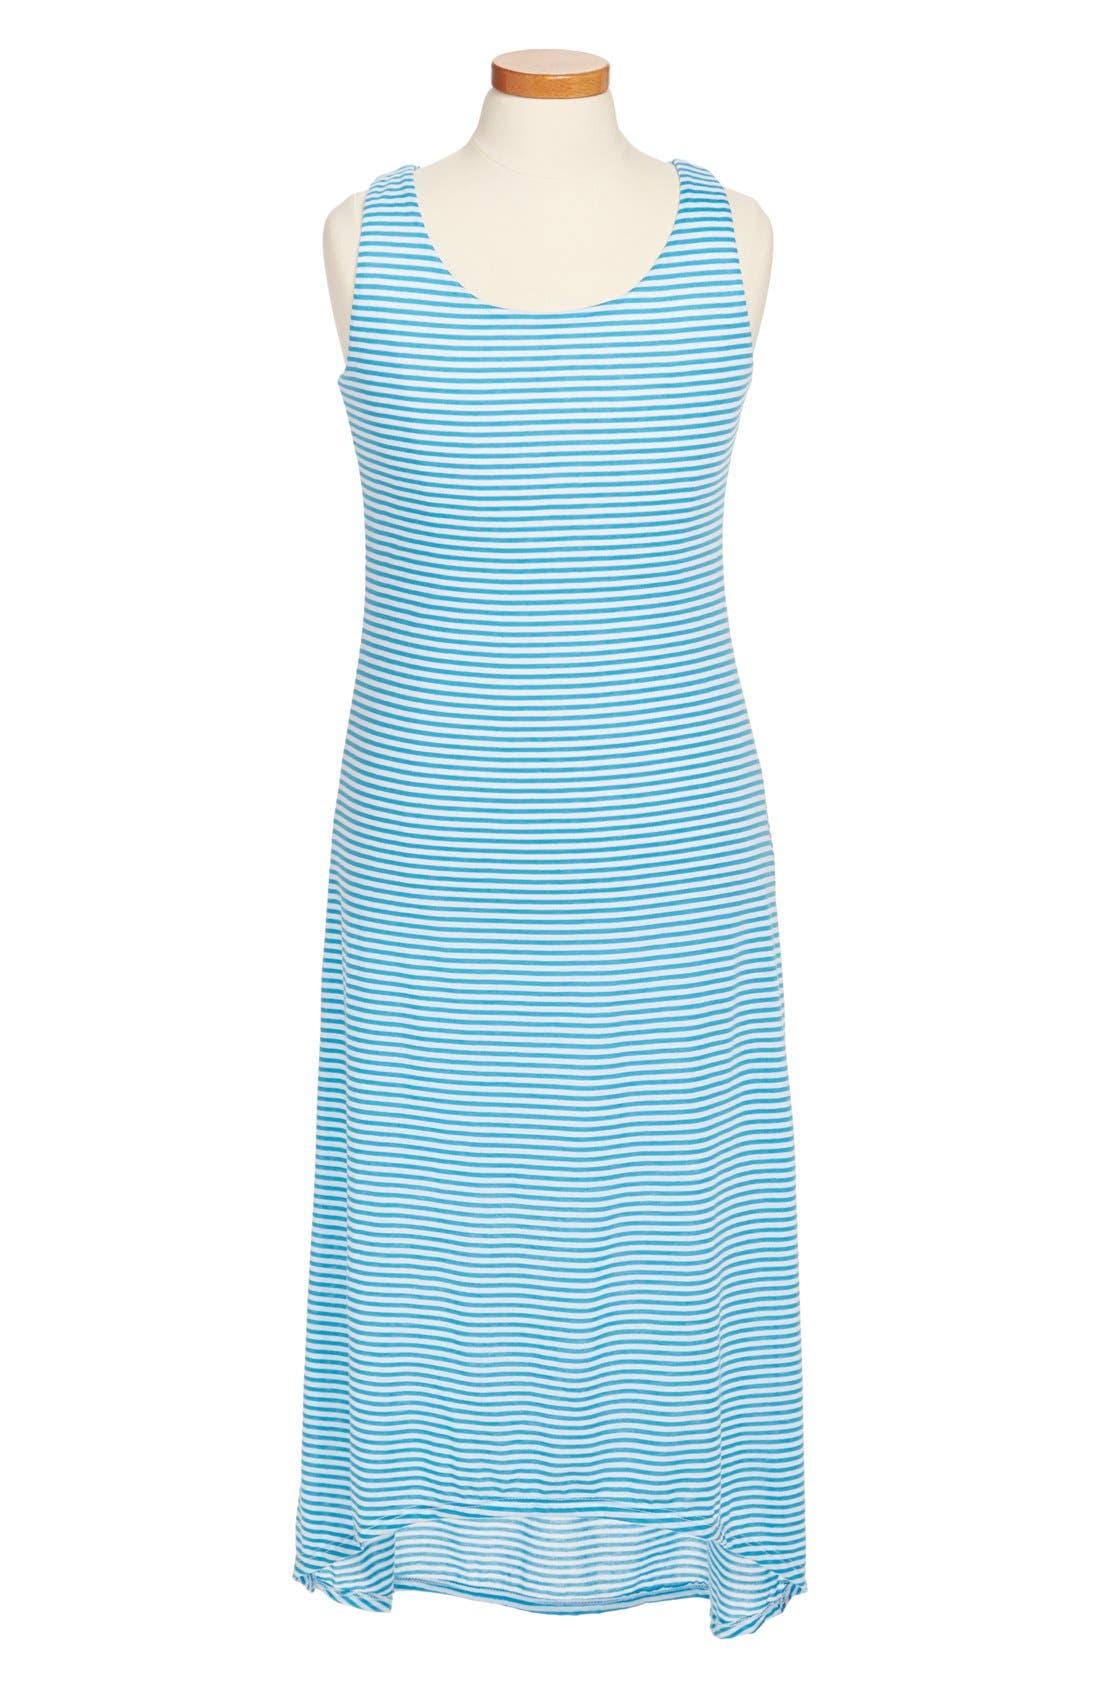 Alternate Image 1 Selected - Mia Chica Stripe Maxi Dress (Little Girls & Big Girls)